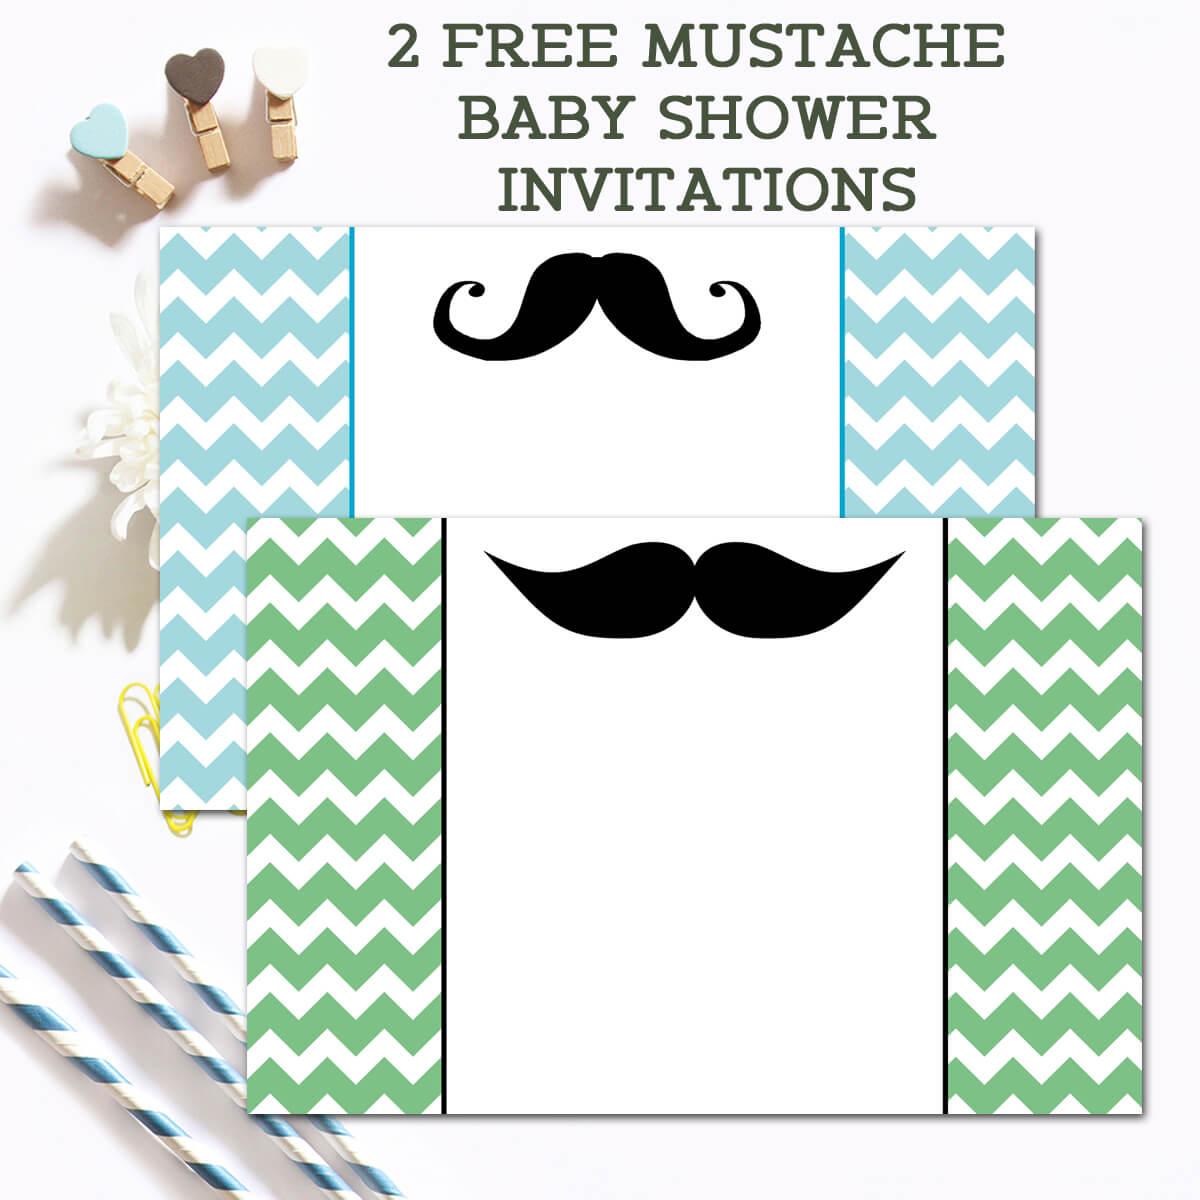 Free Mustache Baby Shower Invitations - Ilona's Passion - Free Printable Mustache Invitations